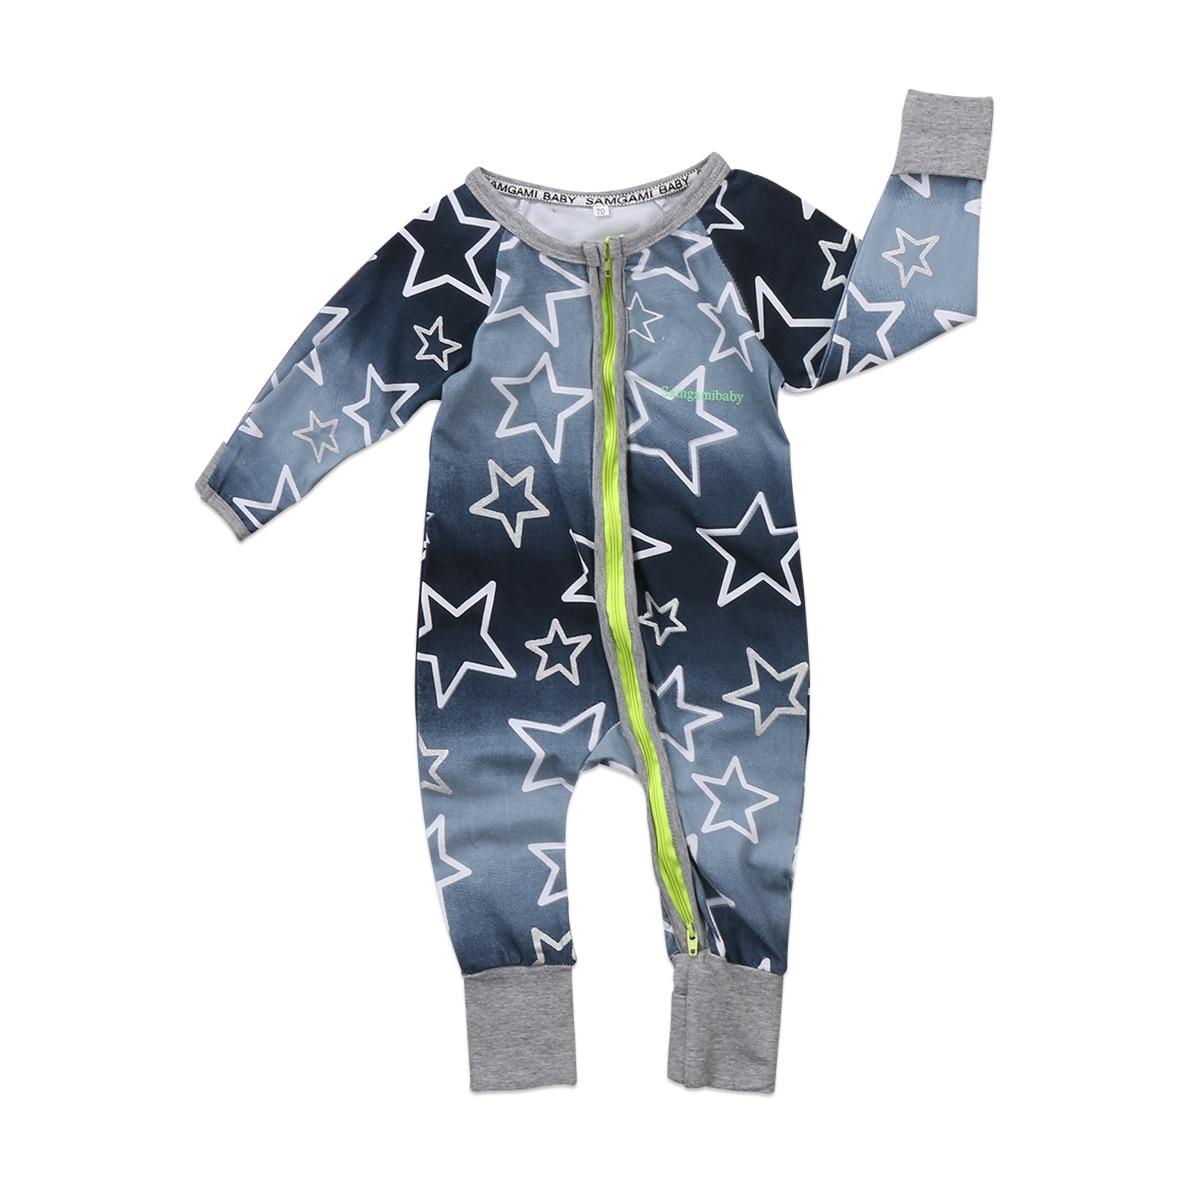 Newborn Infant Baby Boy Girl Floral Zip Up Baby Sleeper